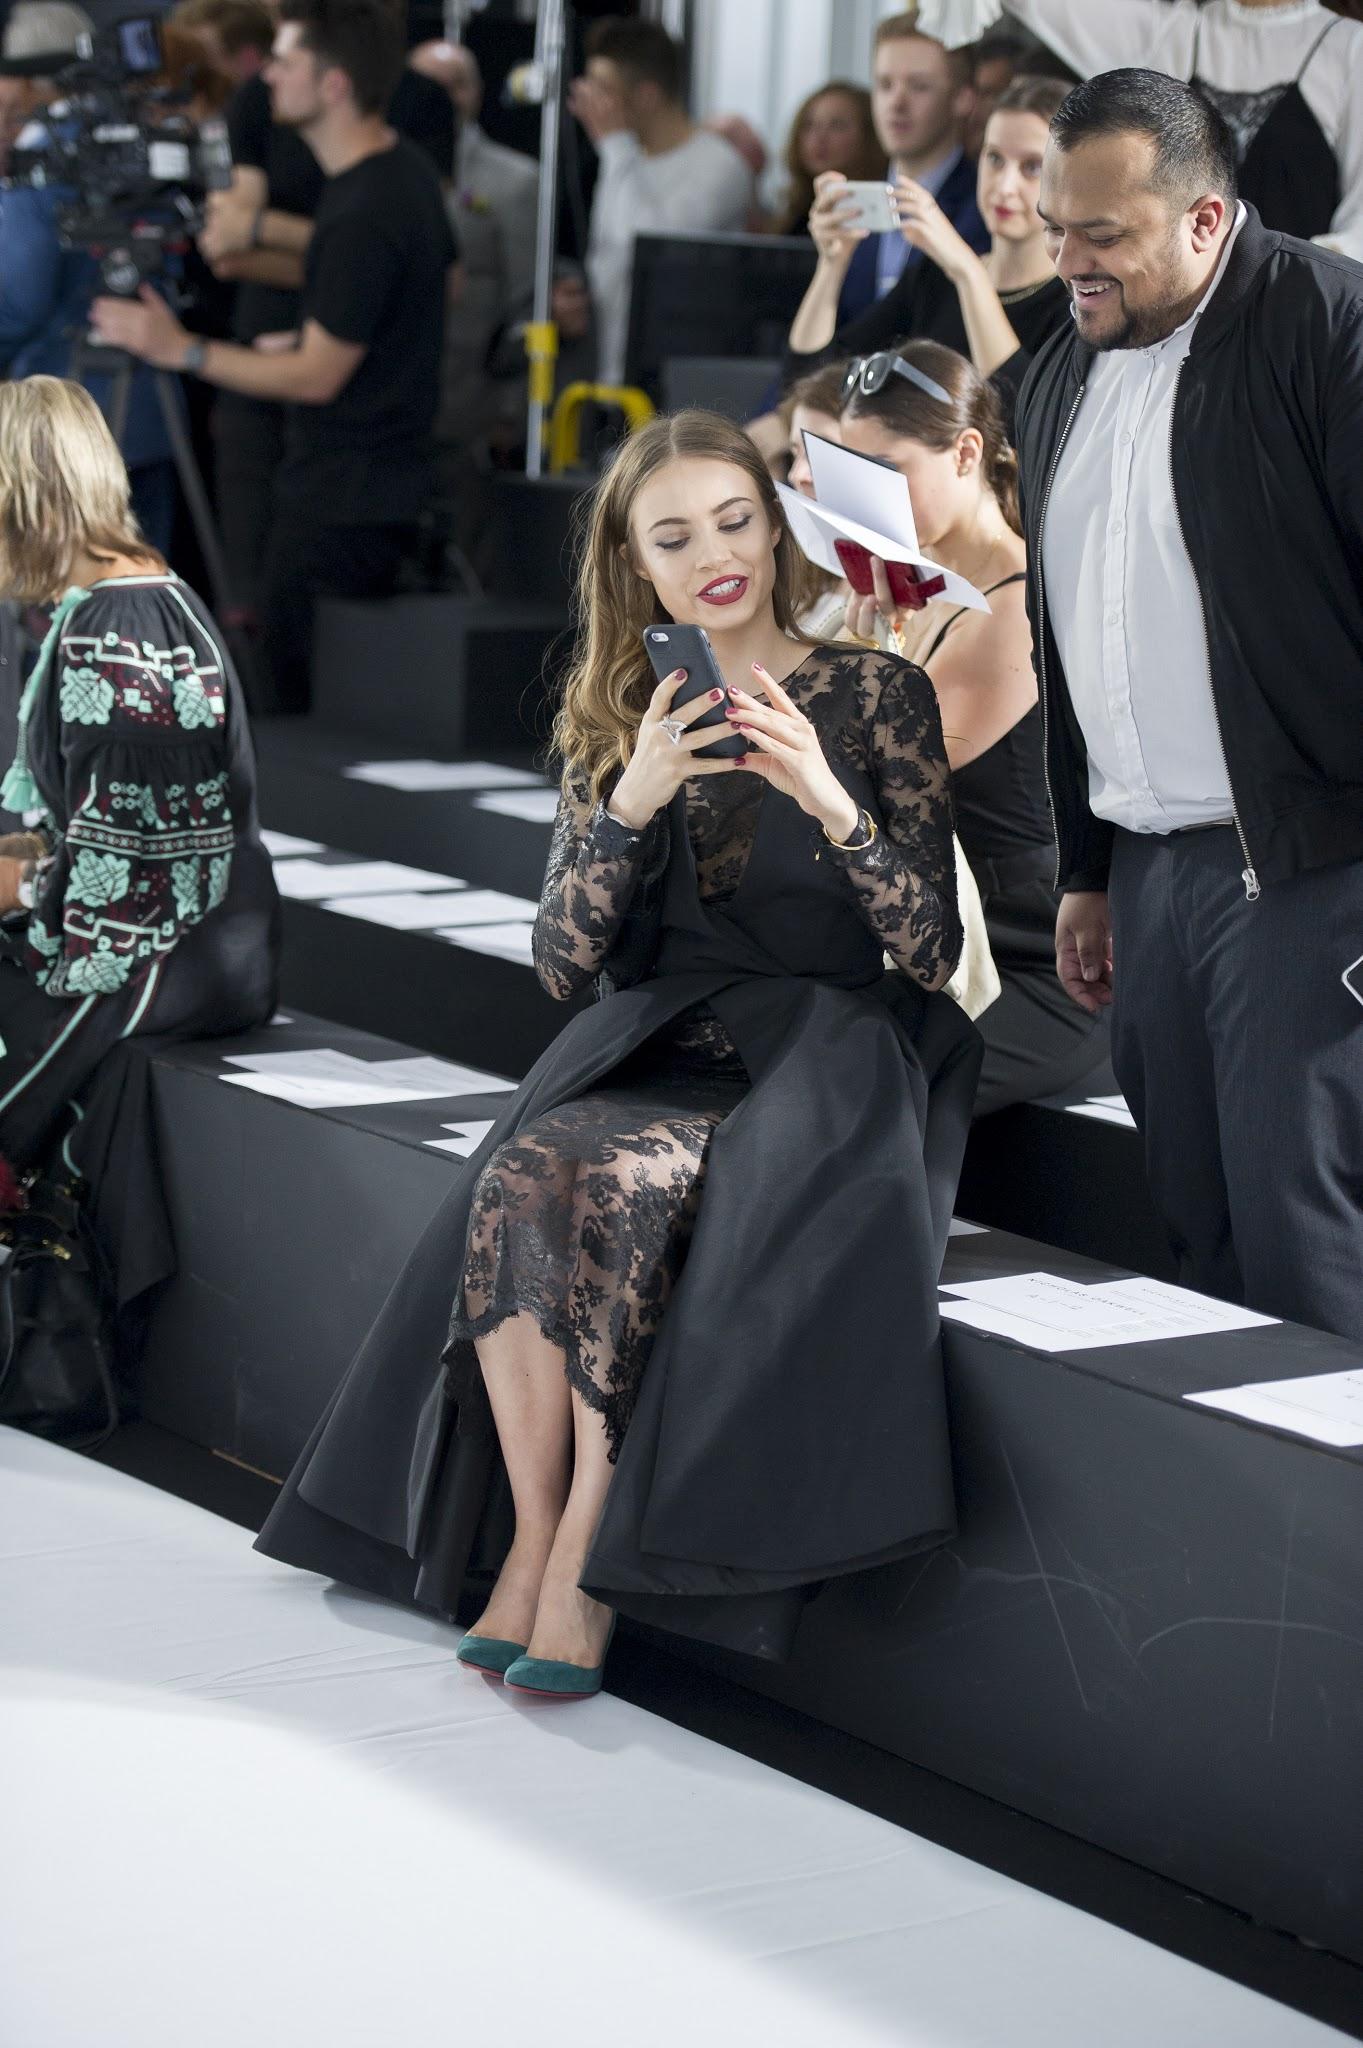 Xenia tchoumitcheva cleavage - 2019 year